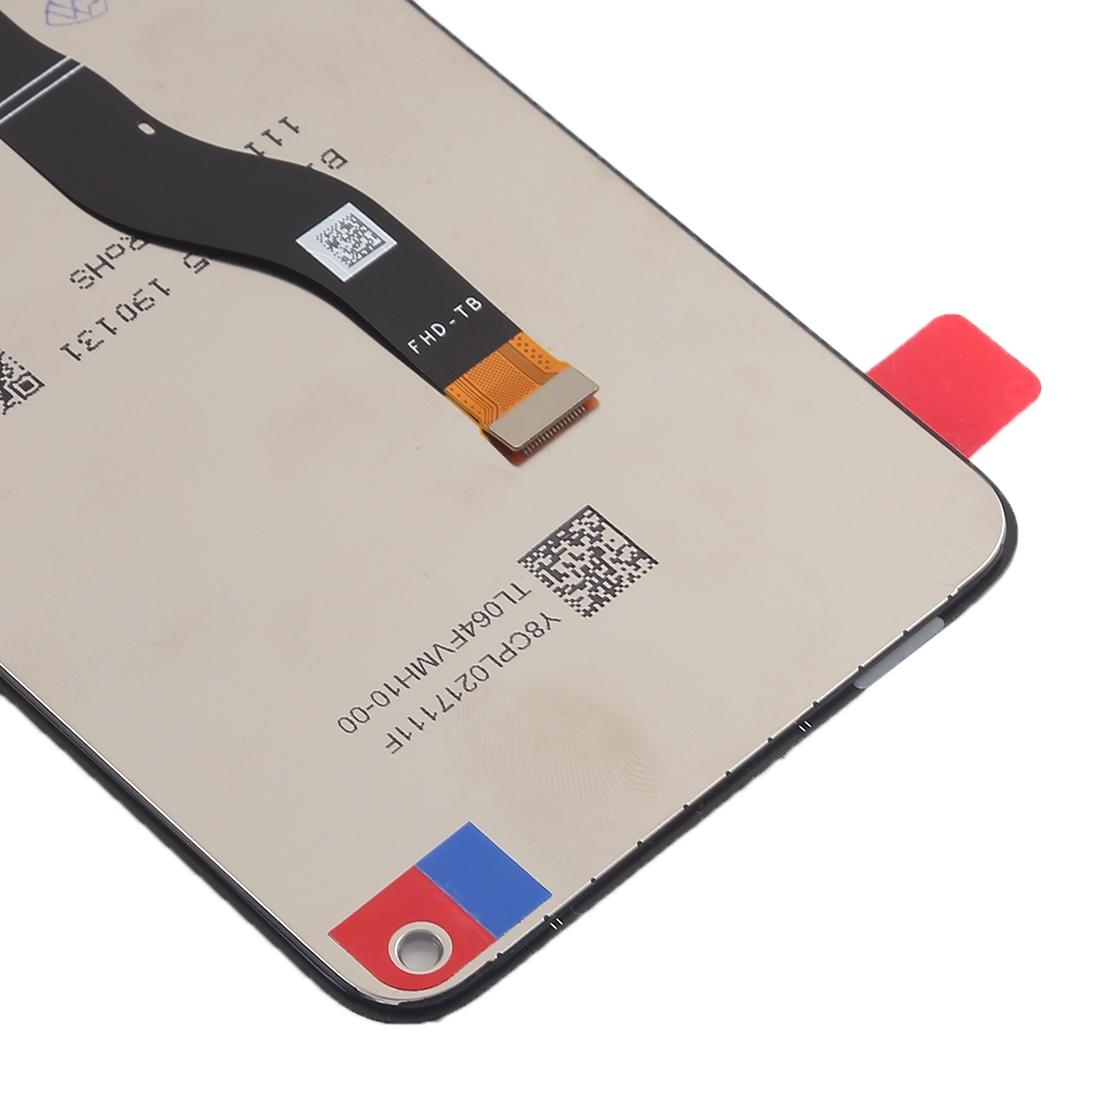 صفحه-نمایش-گوشی-موبایل-lcd-touch-screen-Honor-View-20(3).jpg